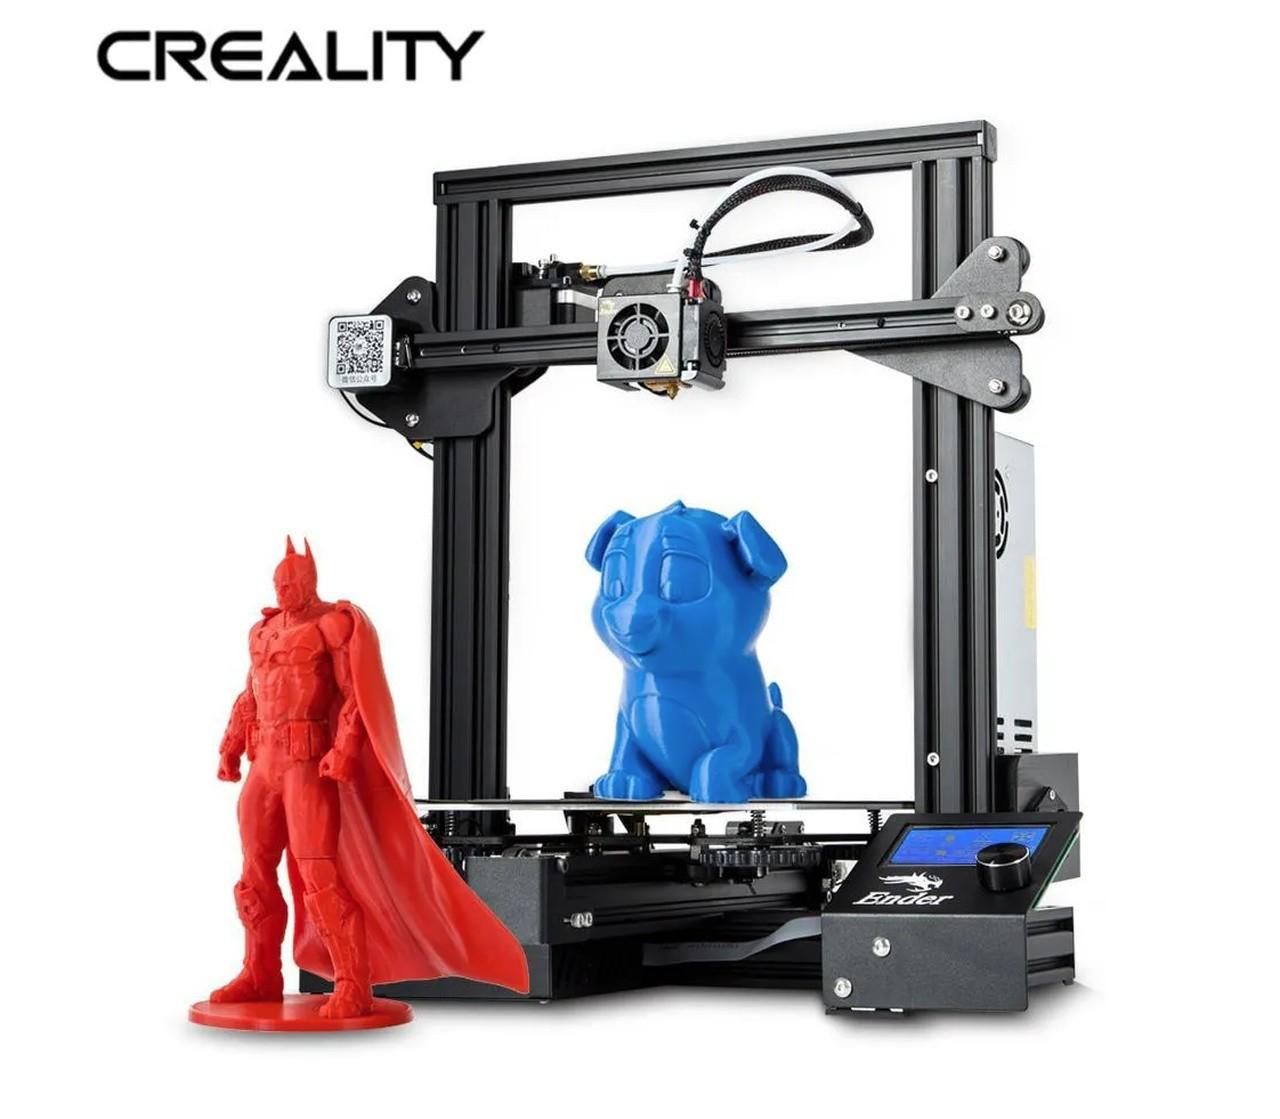 Impressora 3D Creality 3D® + Placa de 32 Bits - Ender 3 PRO - Montada e Testada